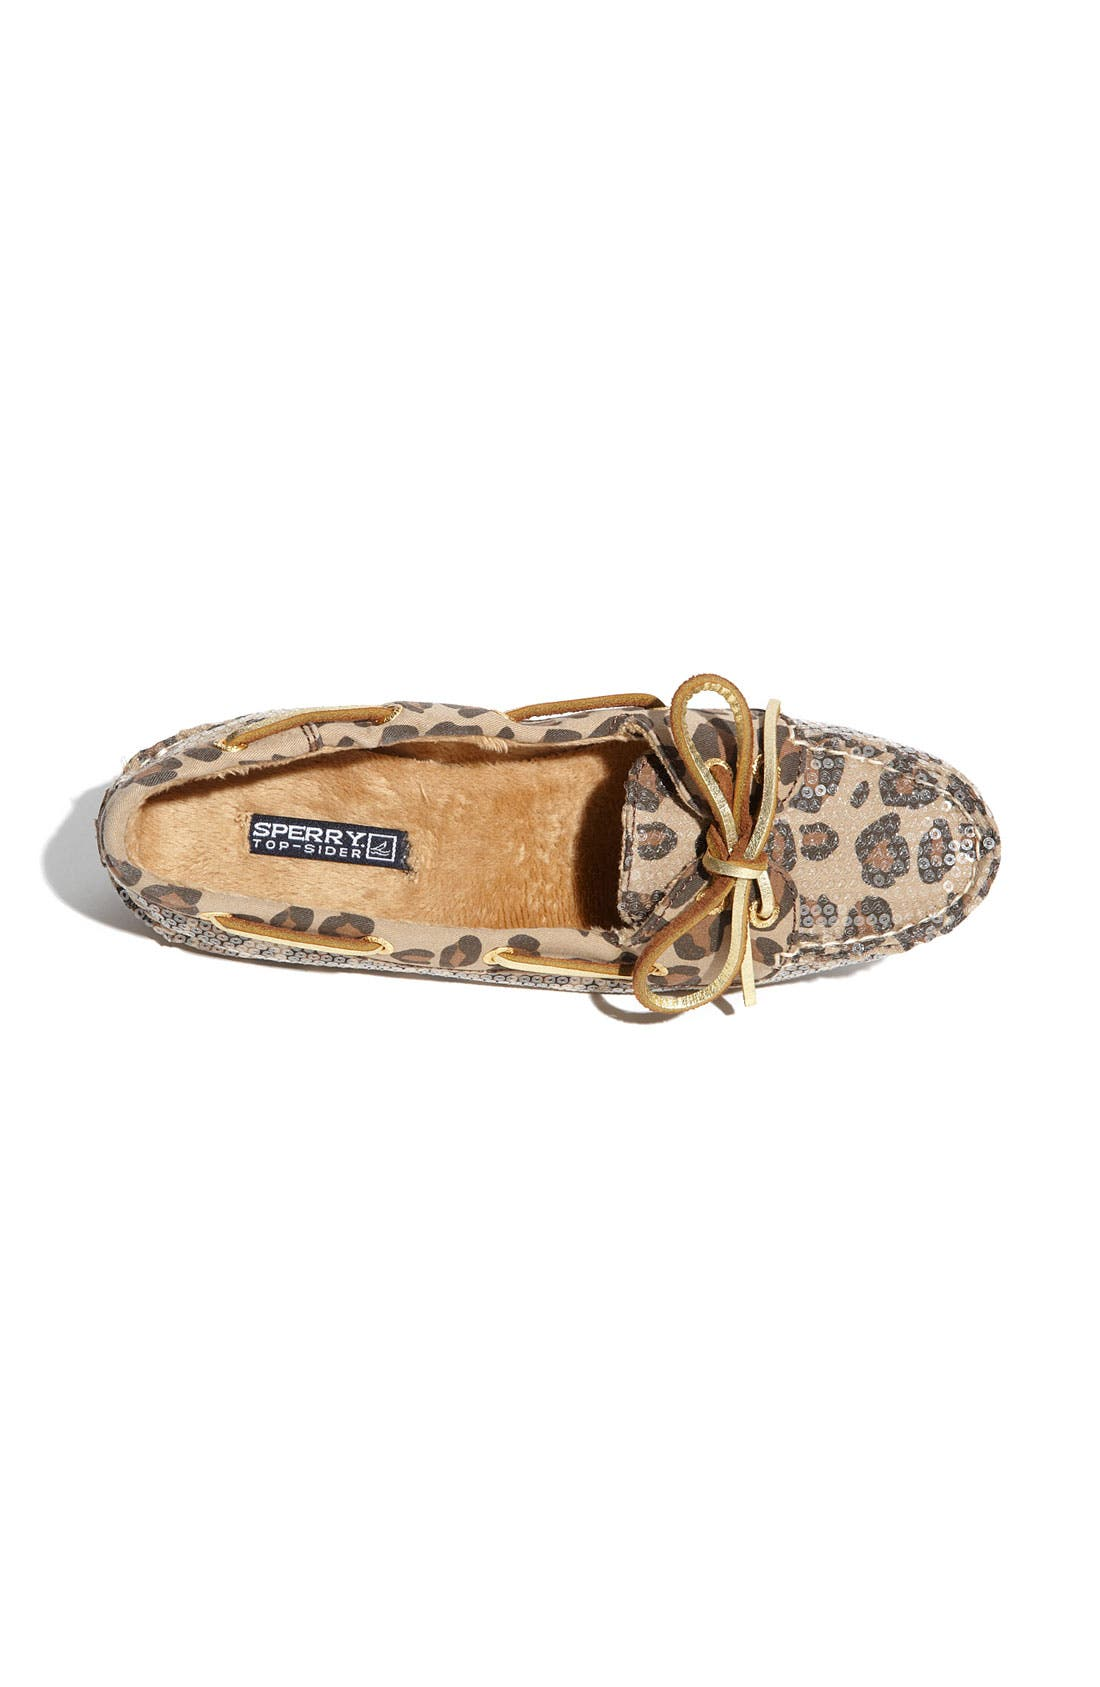 Top-Sider<sup>®</sup> 'Skiff' Moccasin Slip-On,                             Alternate thumbnail 3, color,                             Leopard Sequins